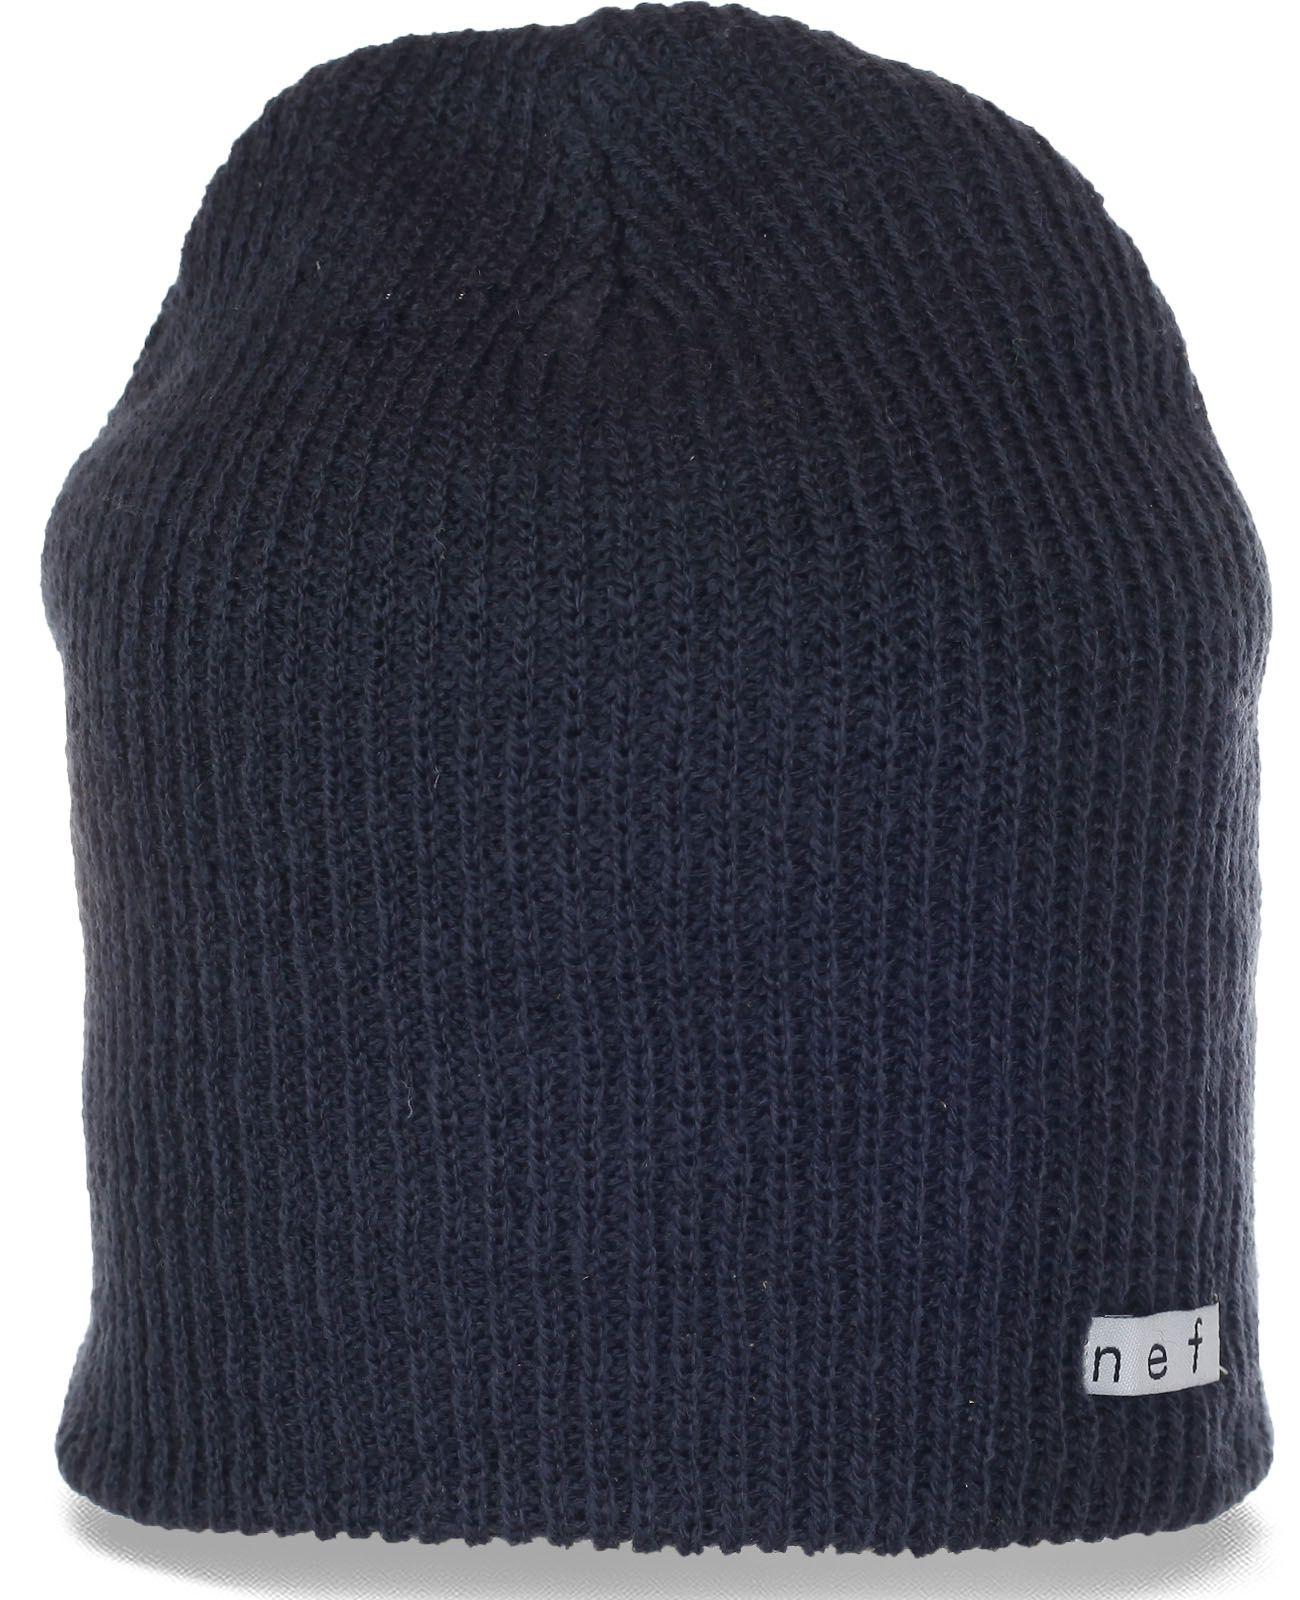 Классная городская мужская шапочка от Neff